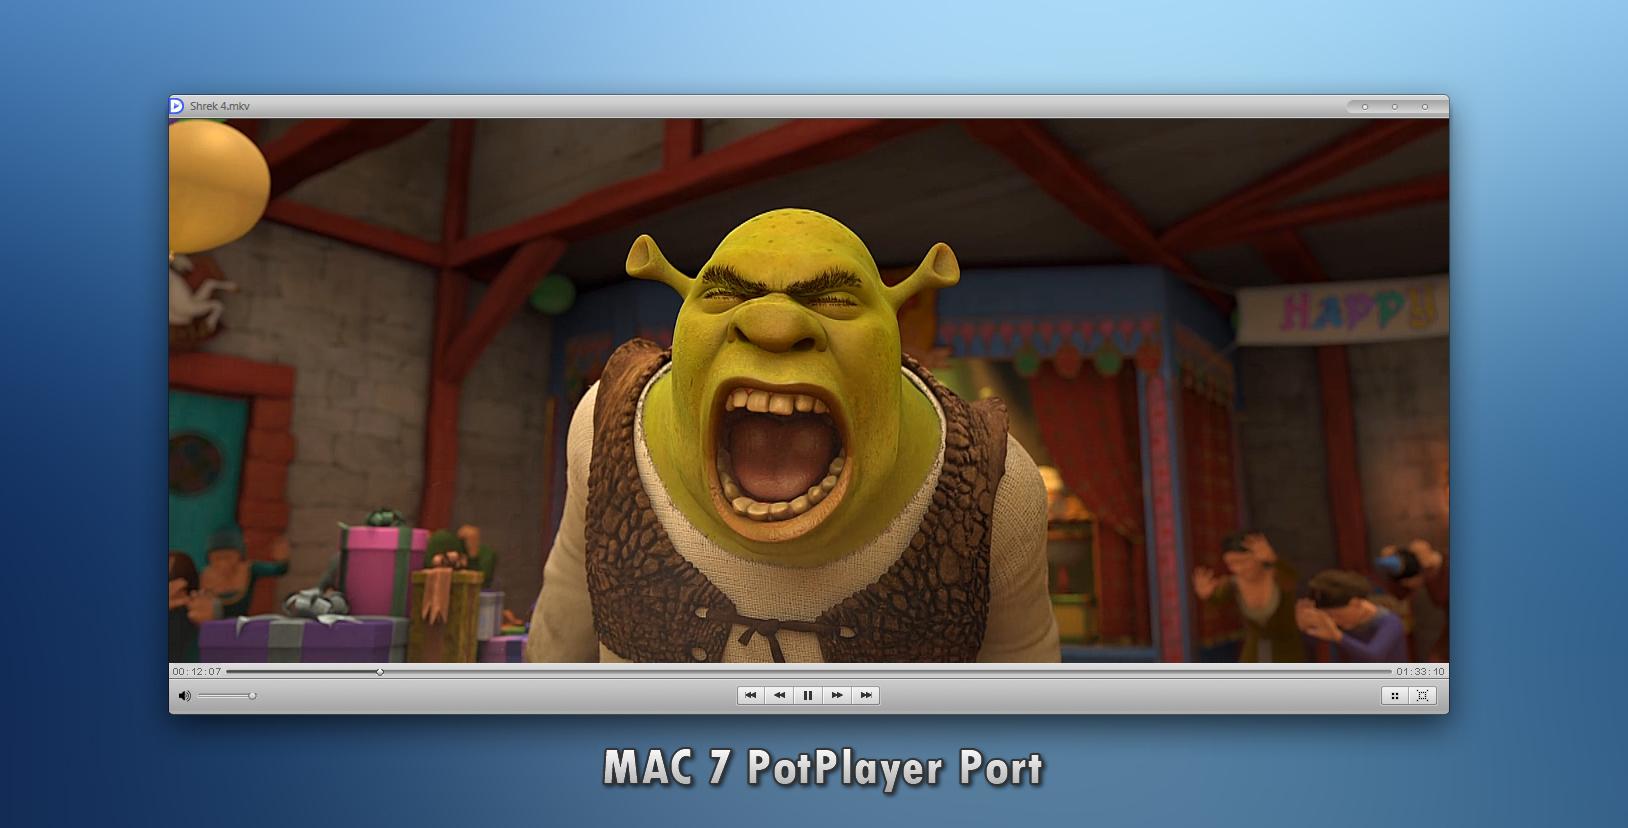 PotPlayer Mac 7 Inspirit Port by dlind87 on DeviantArt